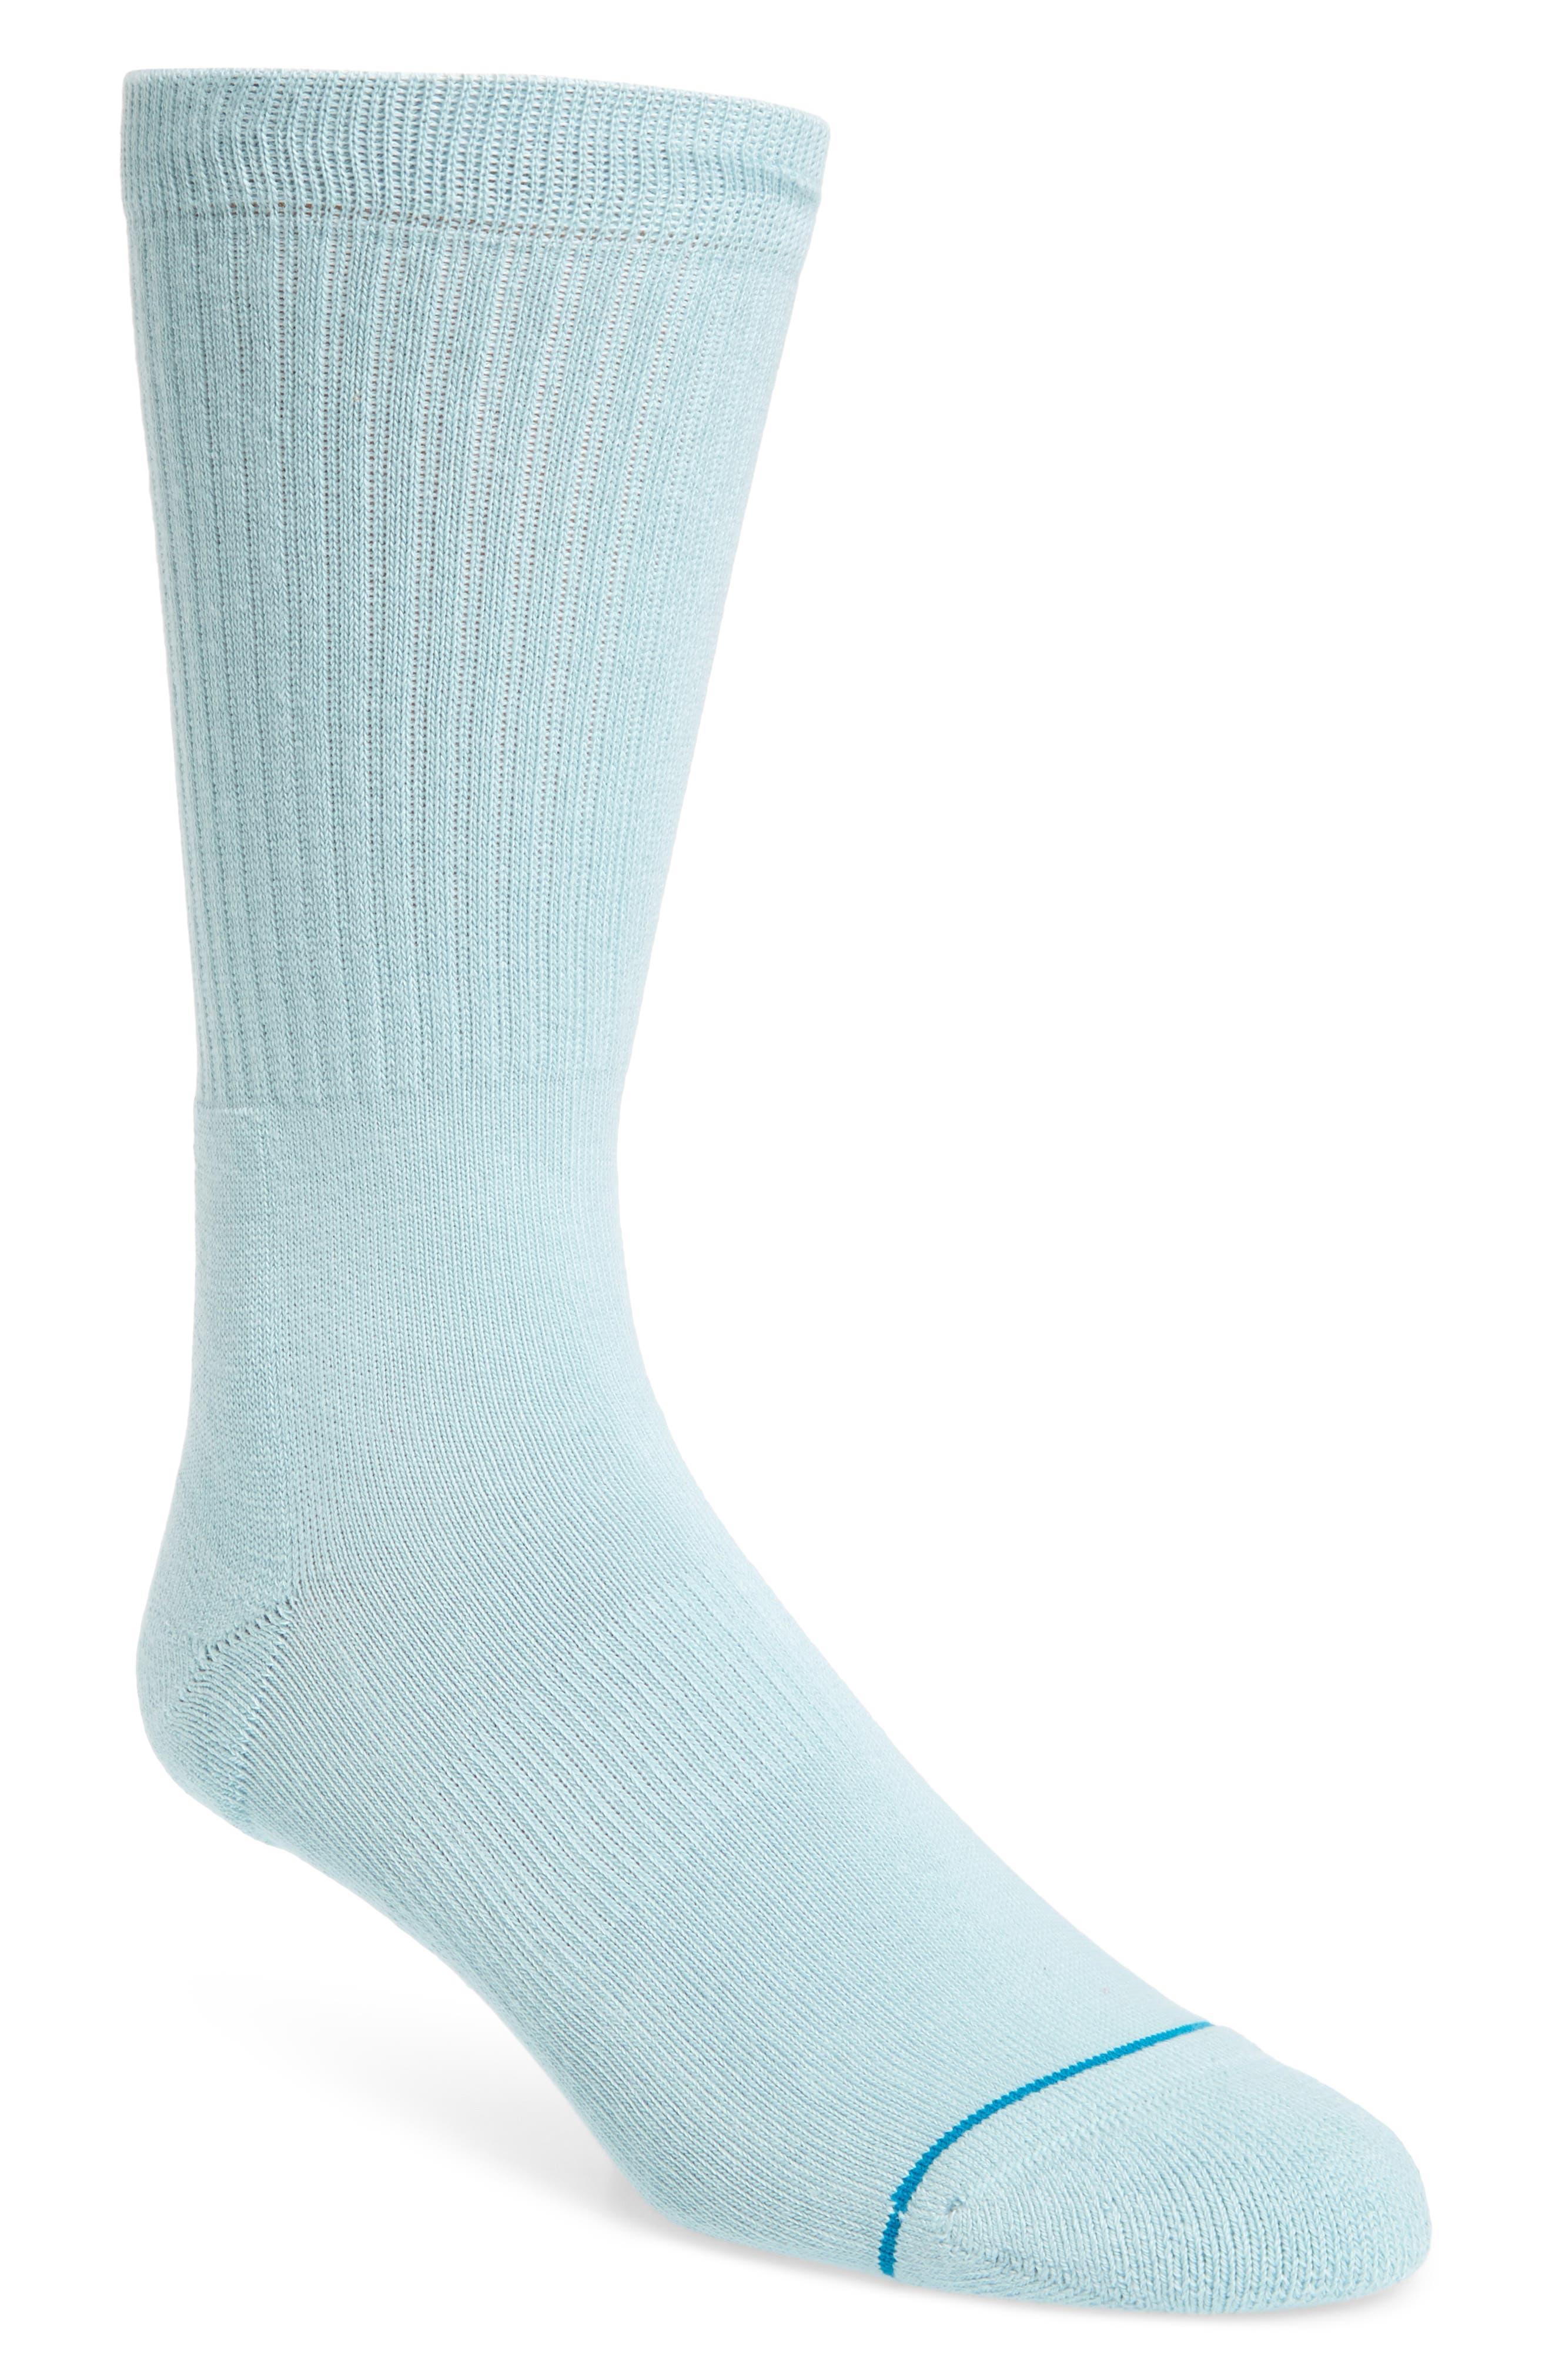 'Icon' Crew Socks,                             Main thumbnail 1, color,                             PASTEL BLUE